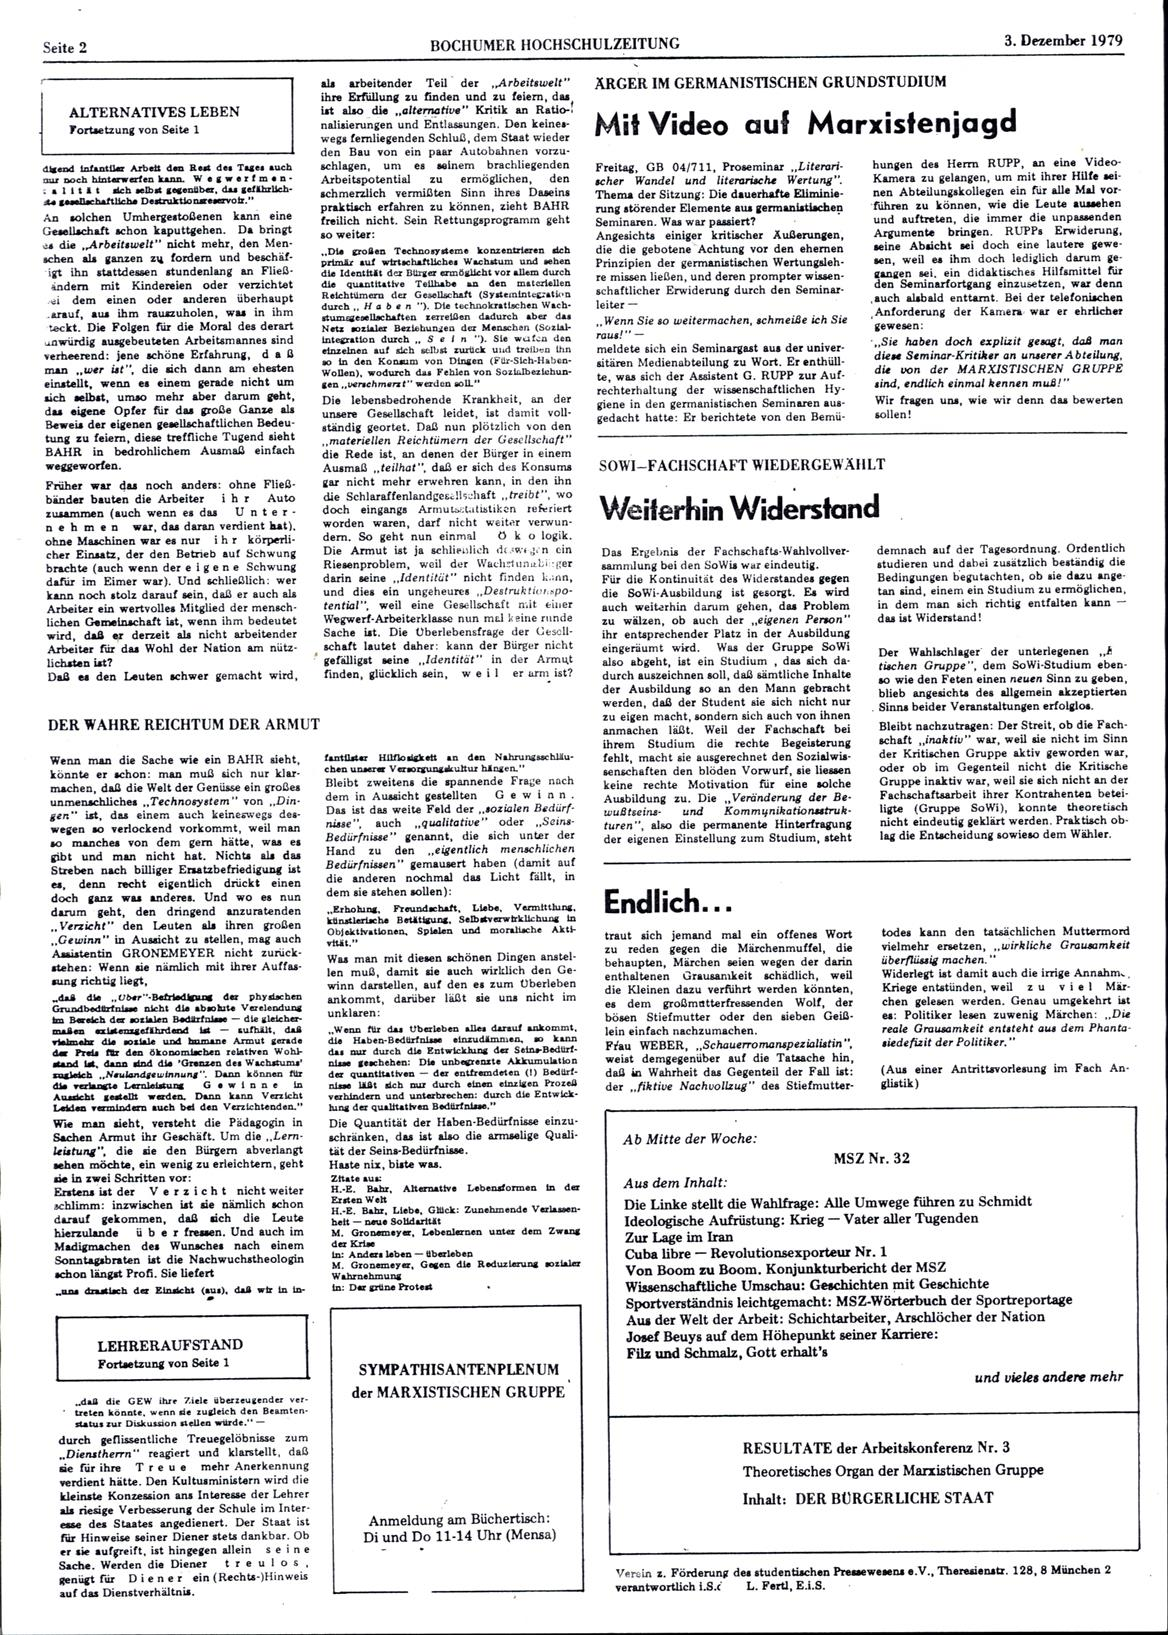 Bochum_BHZ_19791203_003_002